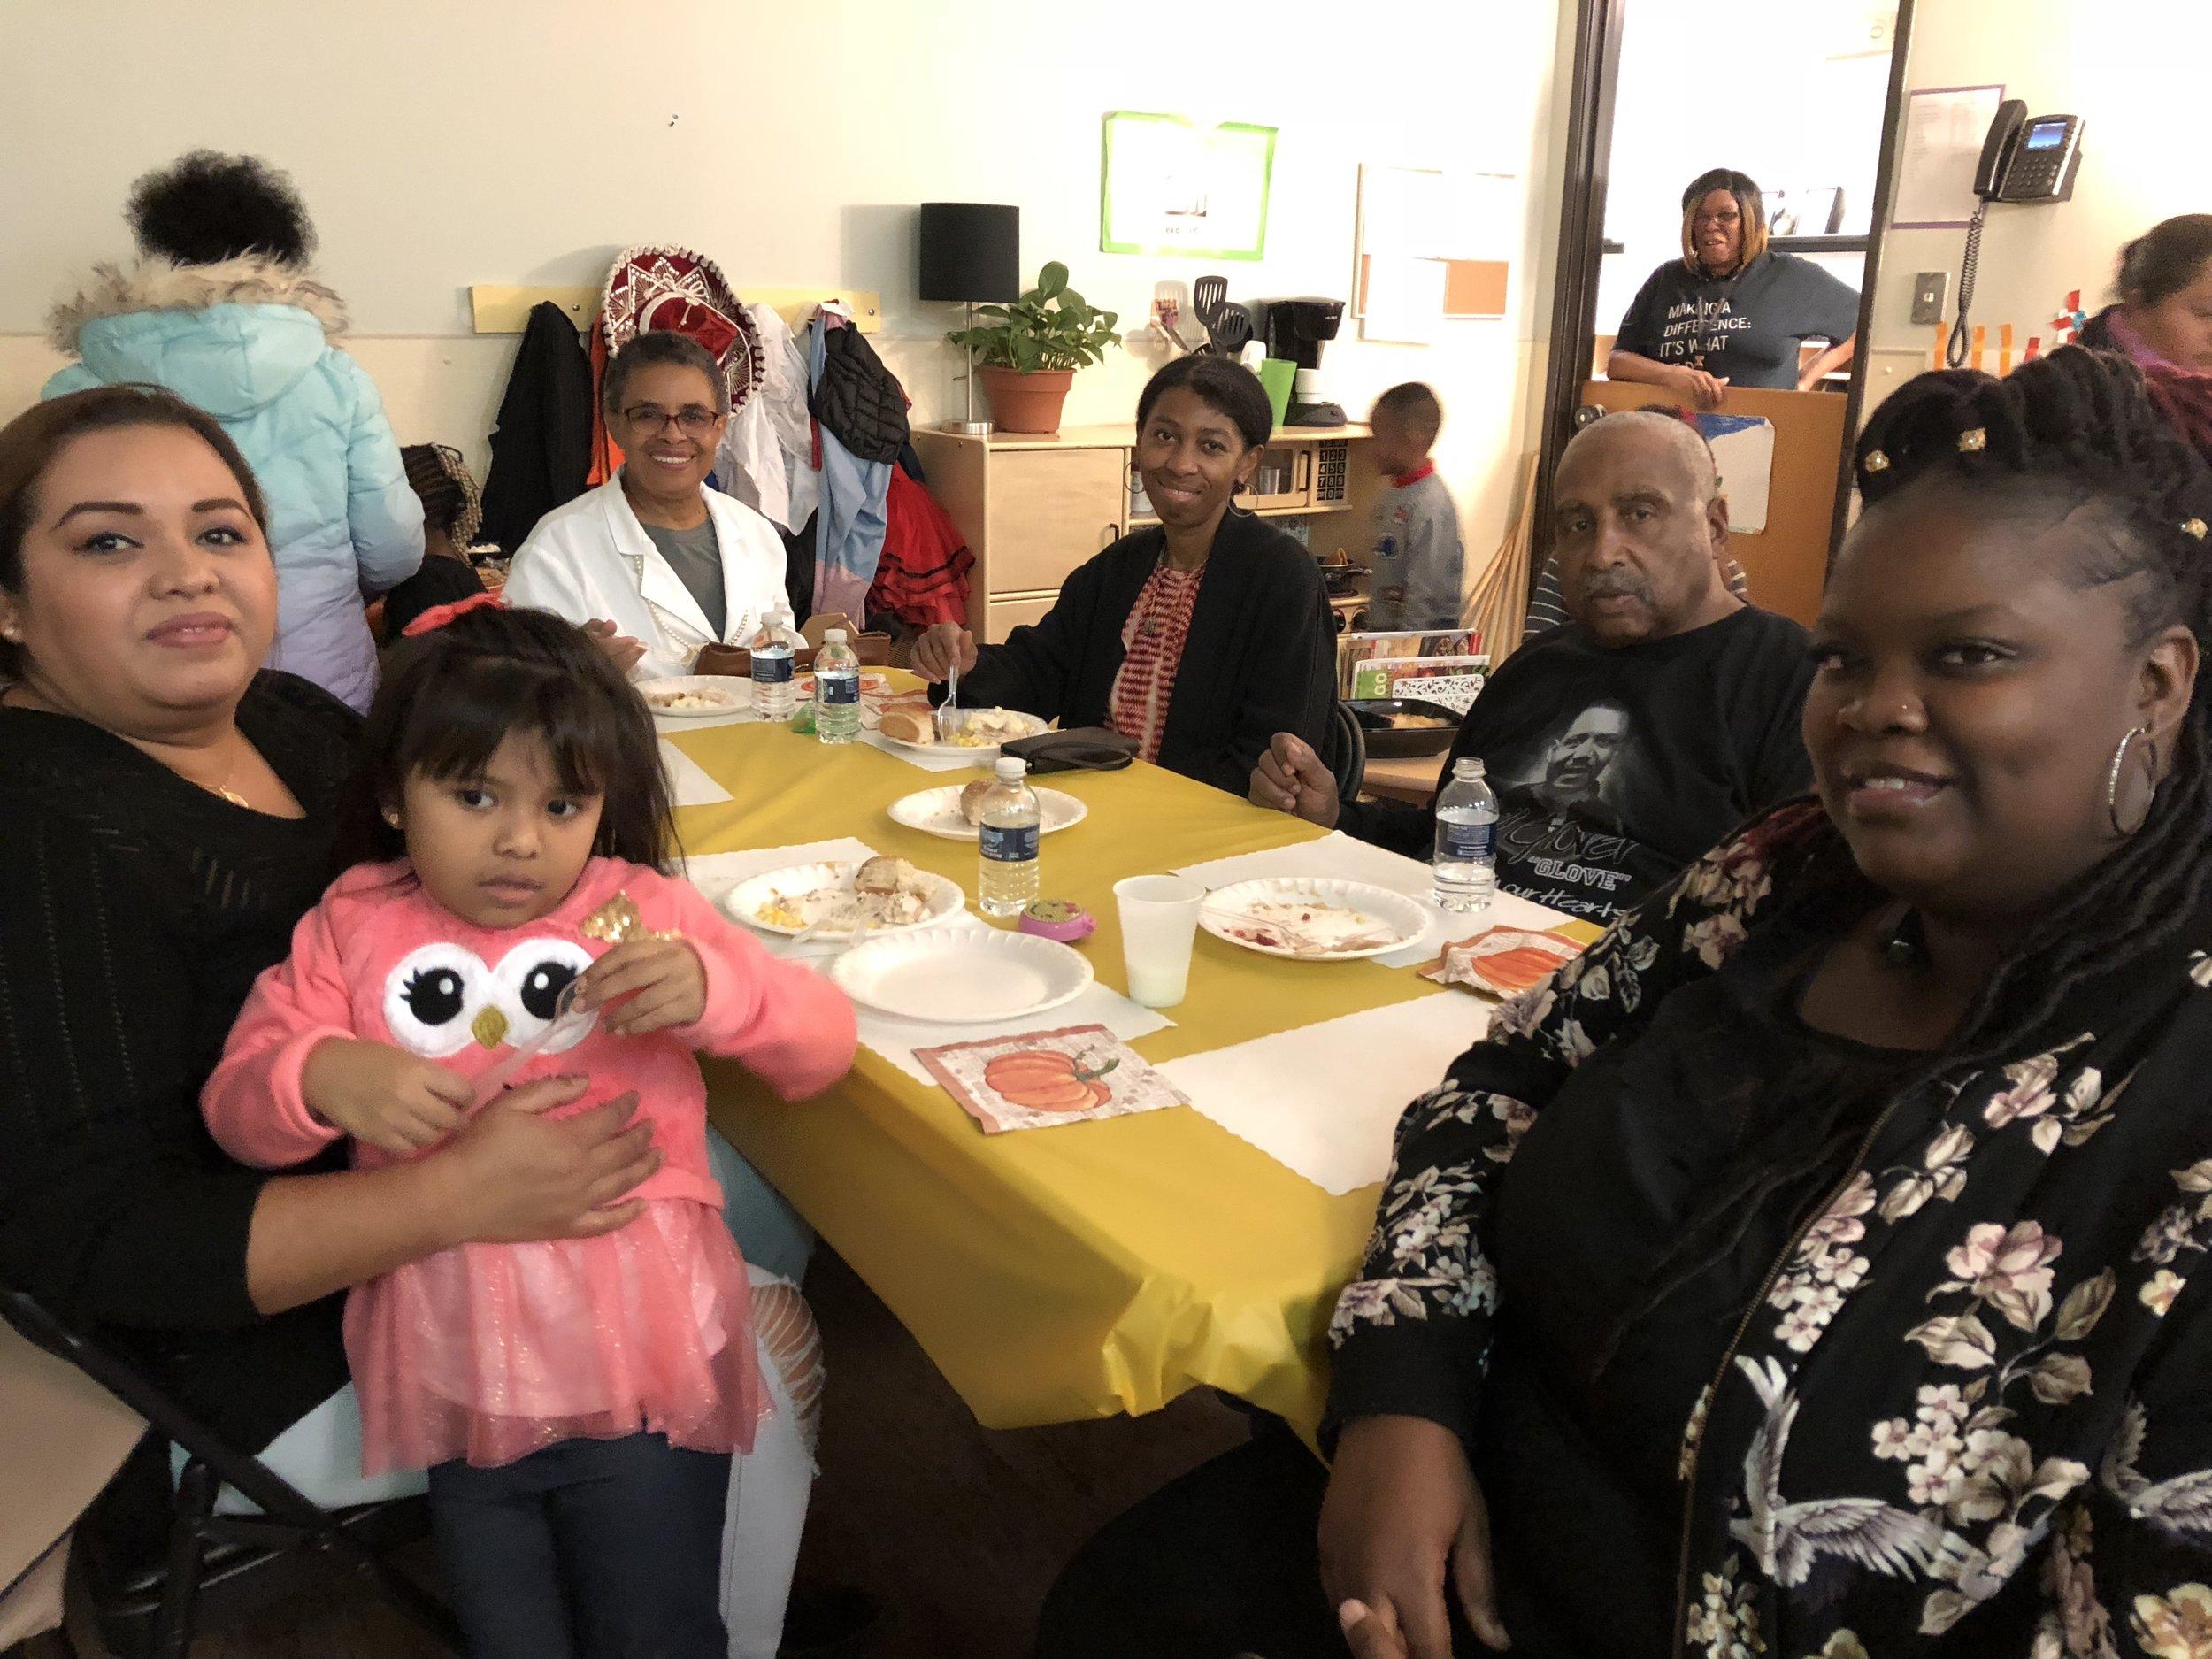 Family members celebrate Friendsgiving.